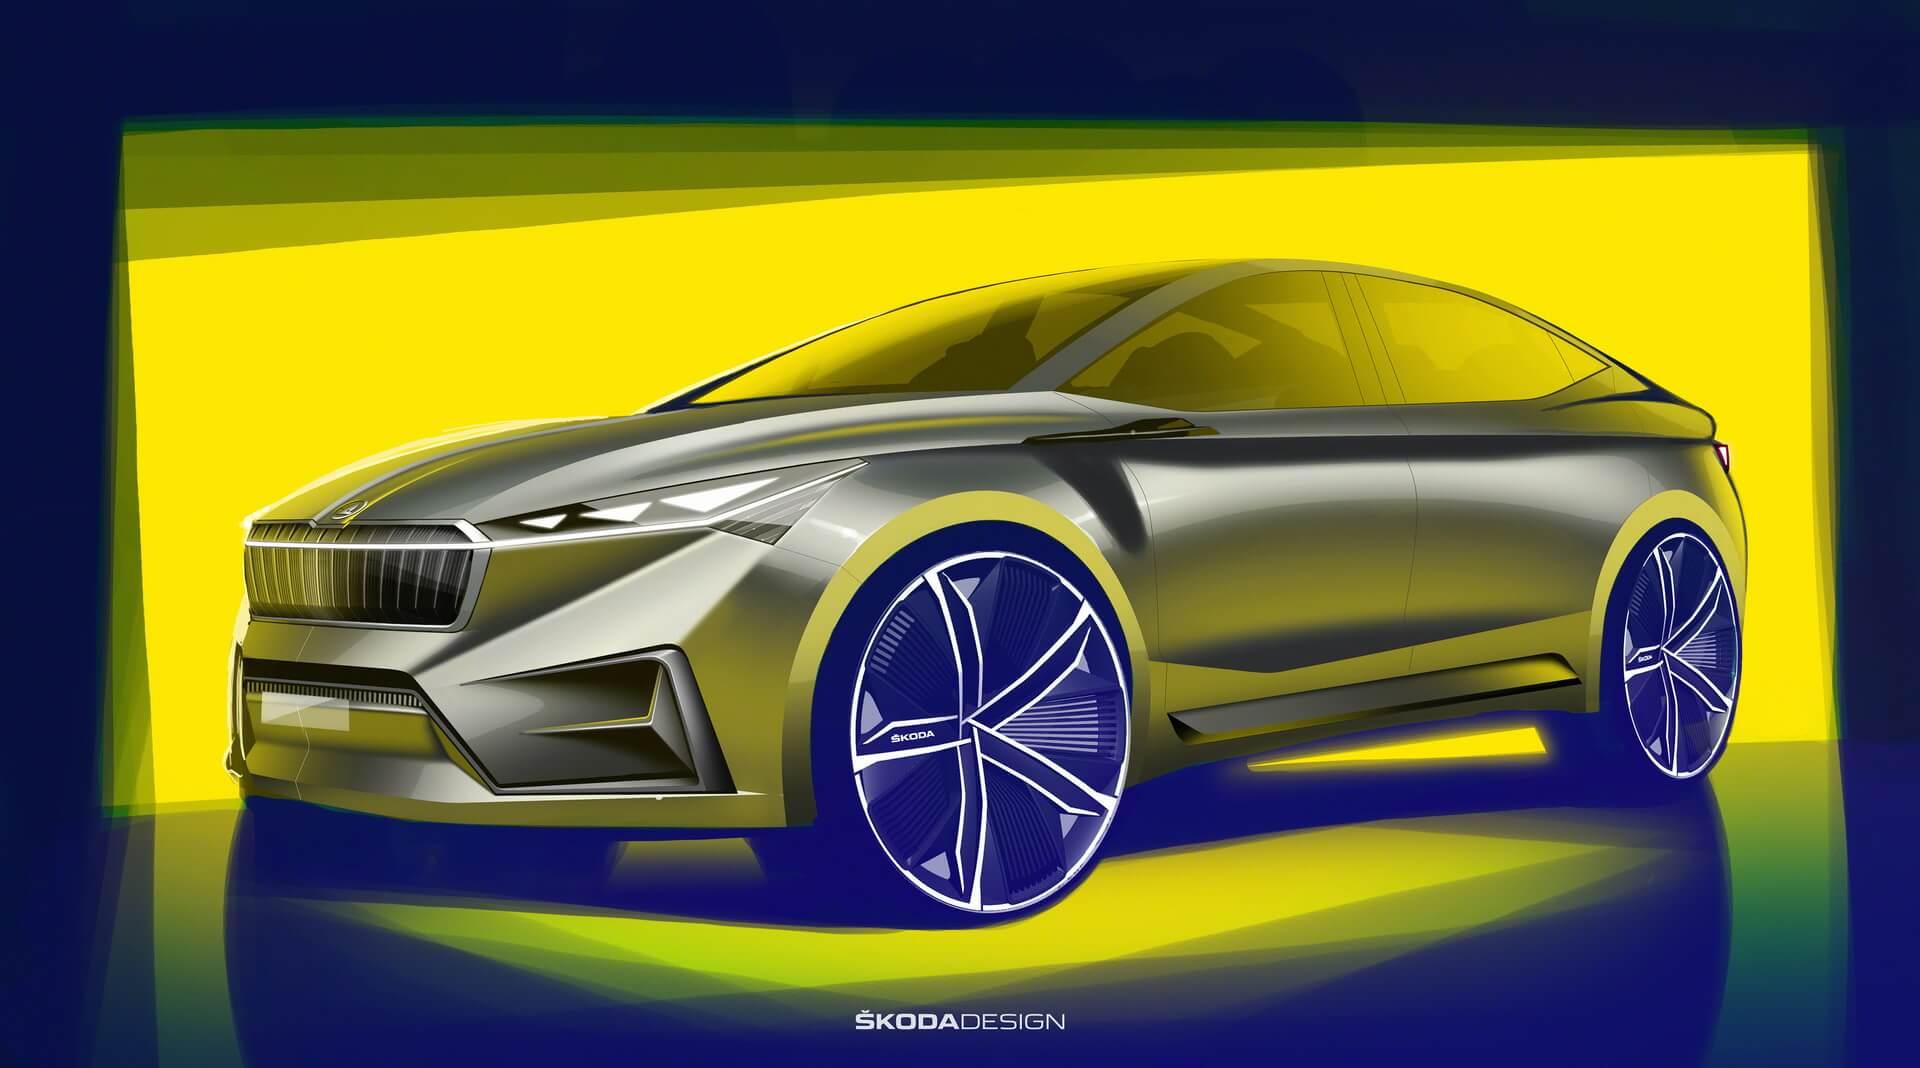 Skoda представила дизайн концепта электромобиля Vision iV